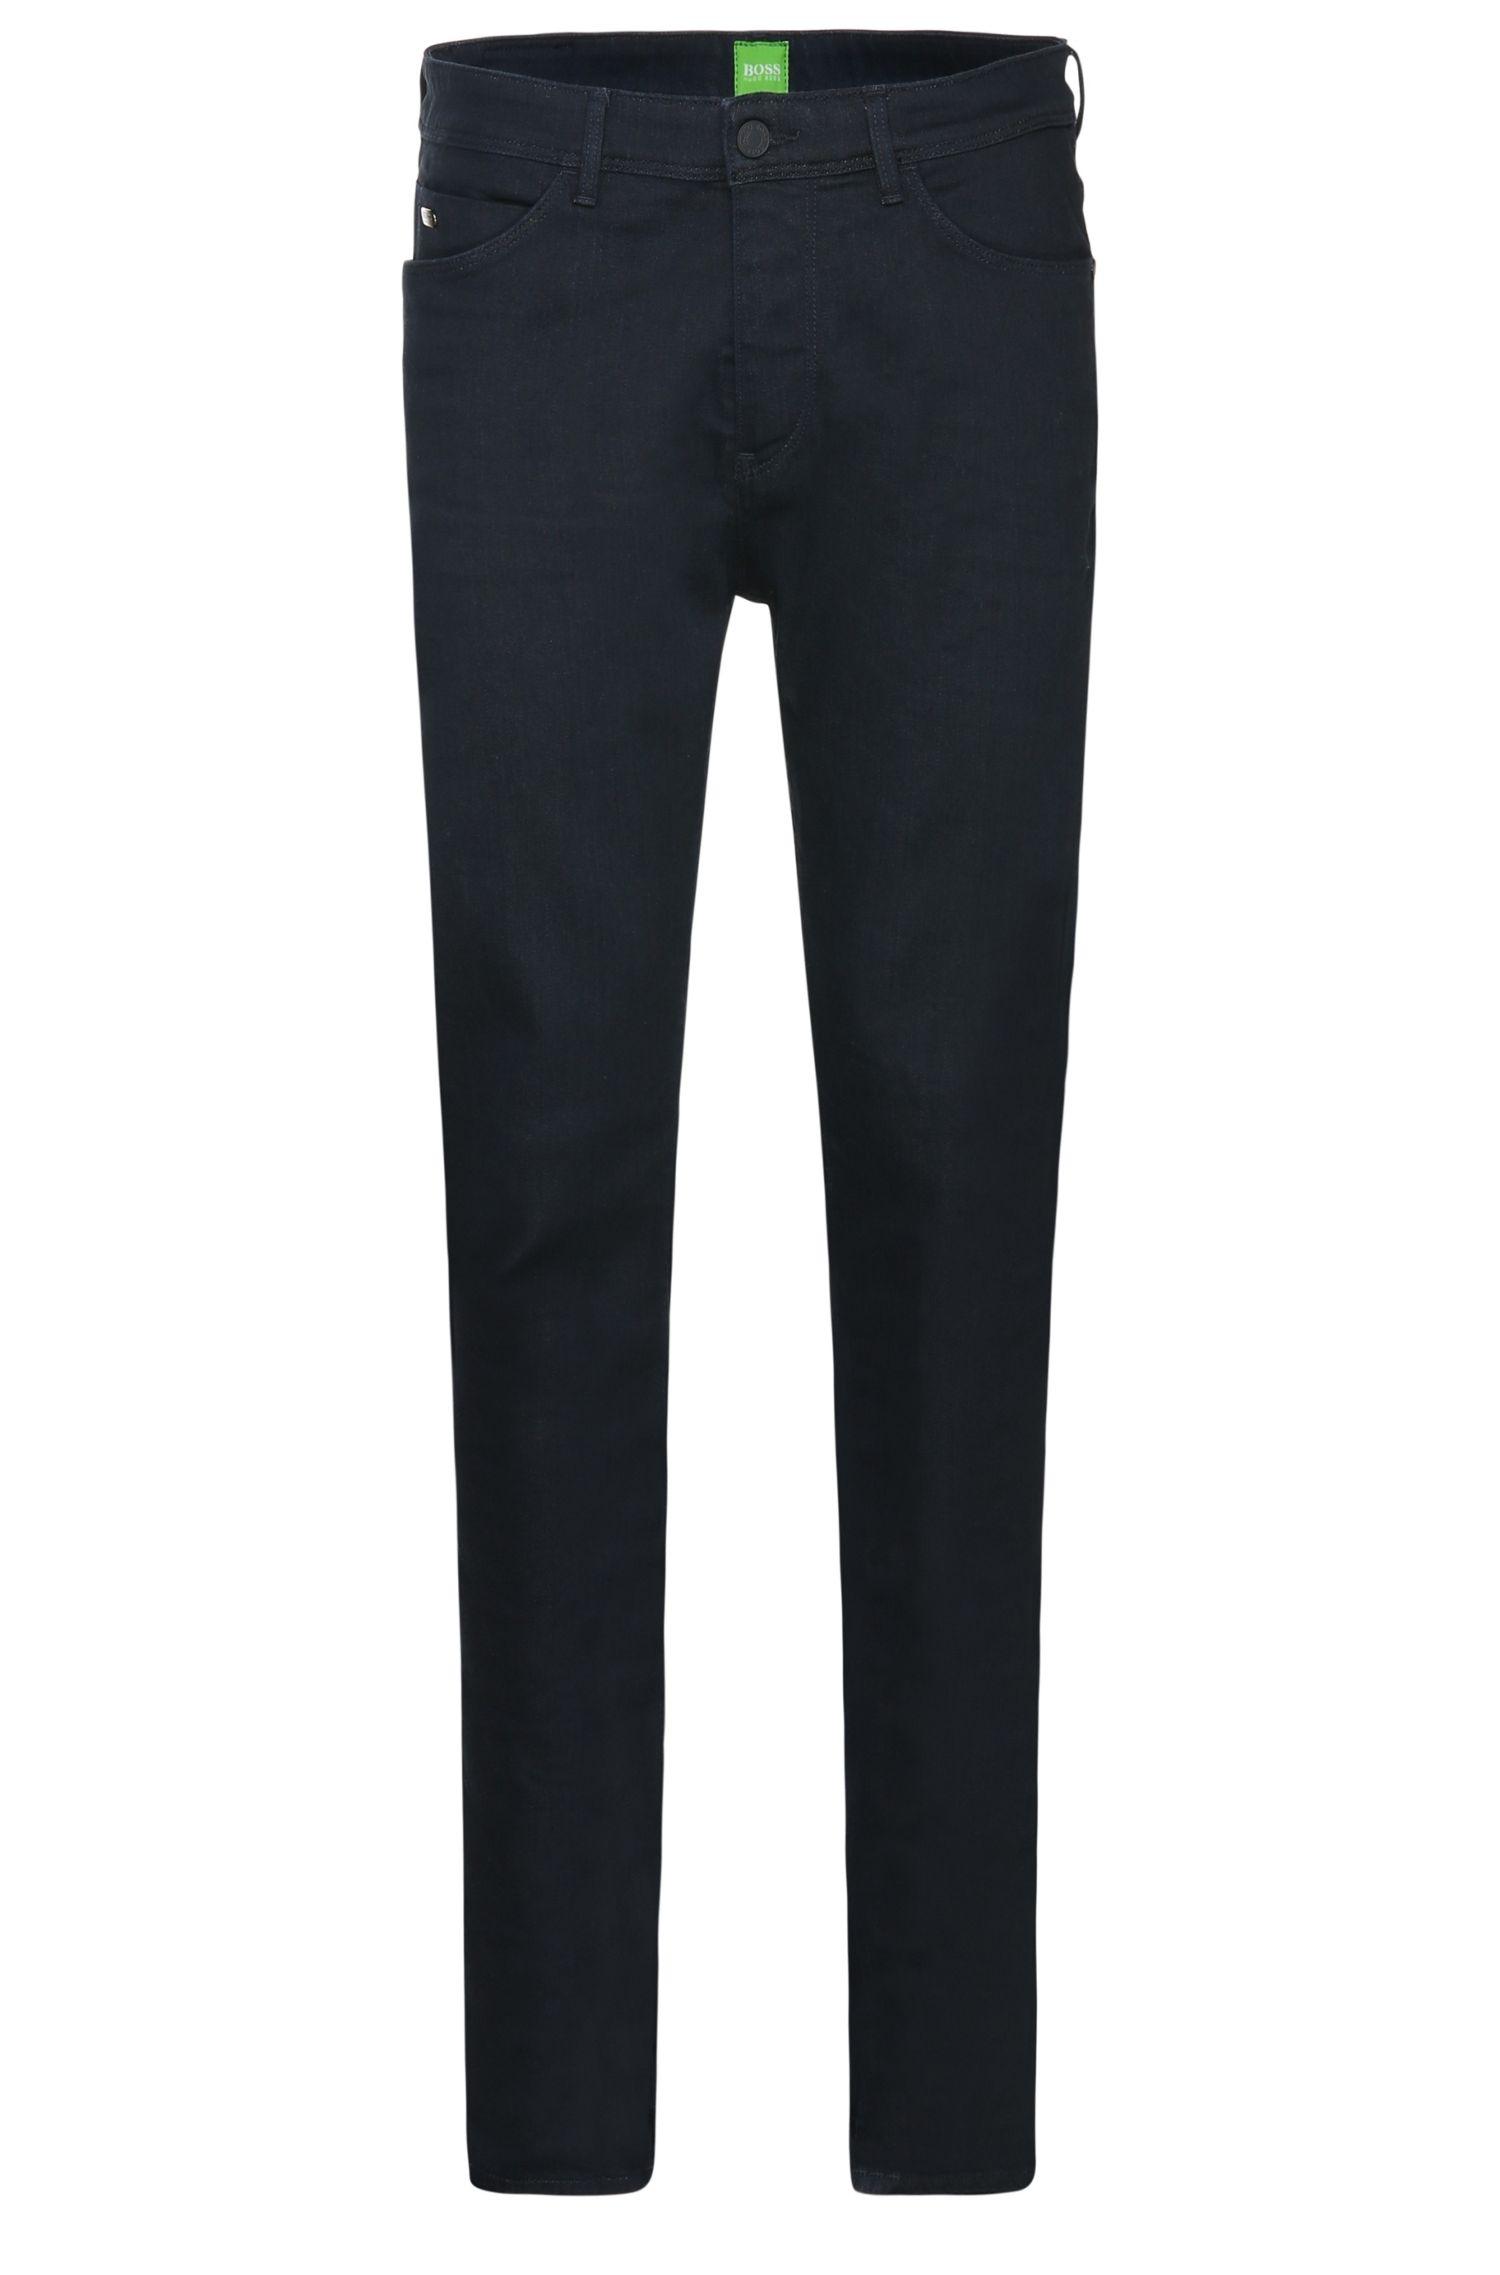 'Derek'   Tapered Fit, 10 oz Stretch Cotton Blend Jeans